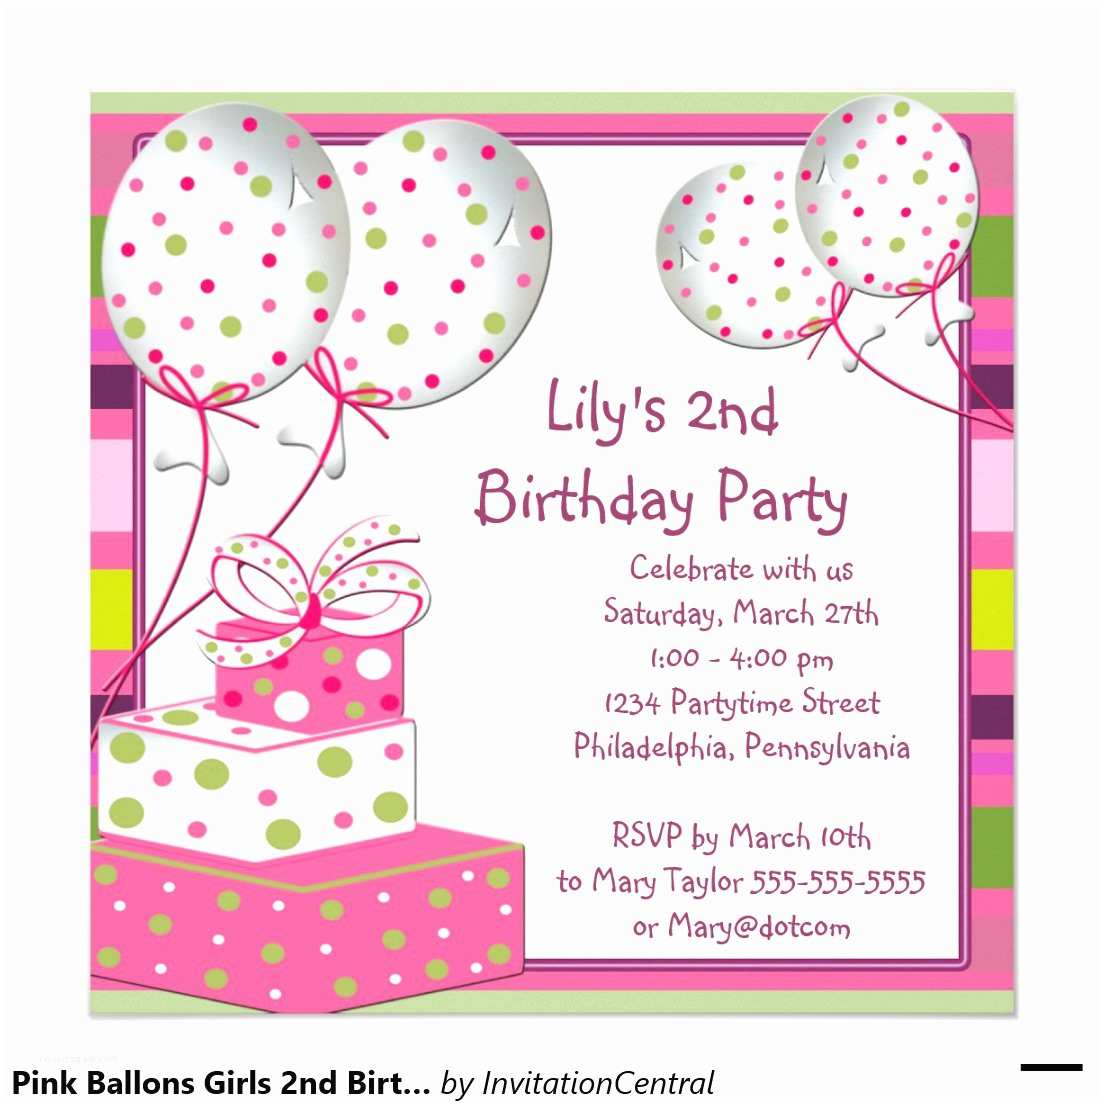 Birthday Invitation Cards Birthday Party Invitation Card